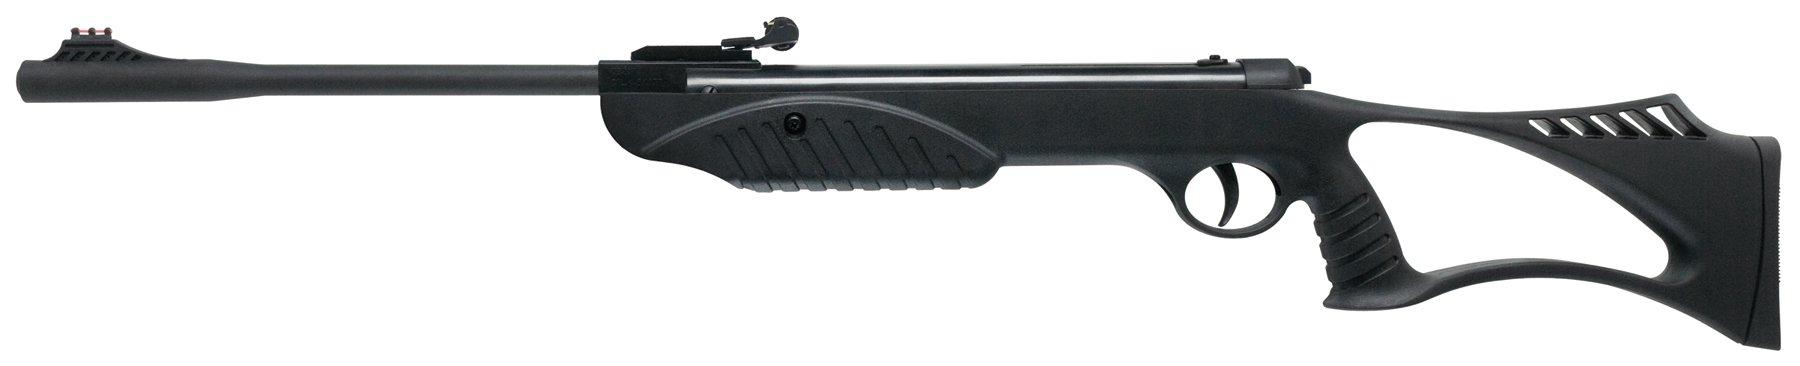 Ruger Explorer Youth Break Barrel .177 Caliber Pellet Gun Air Rifle by Umarex